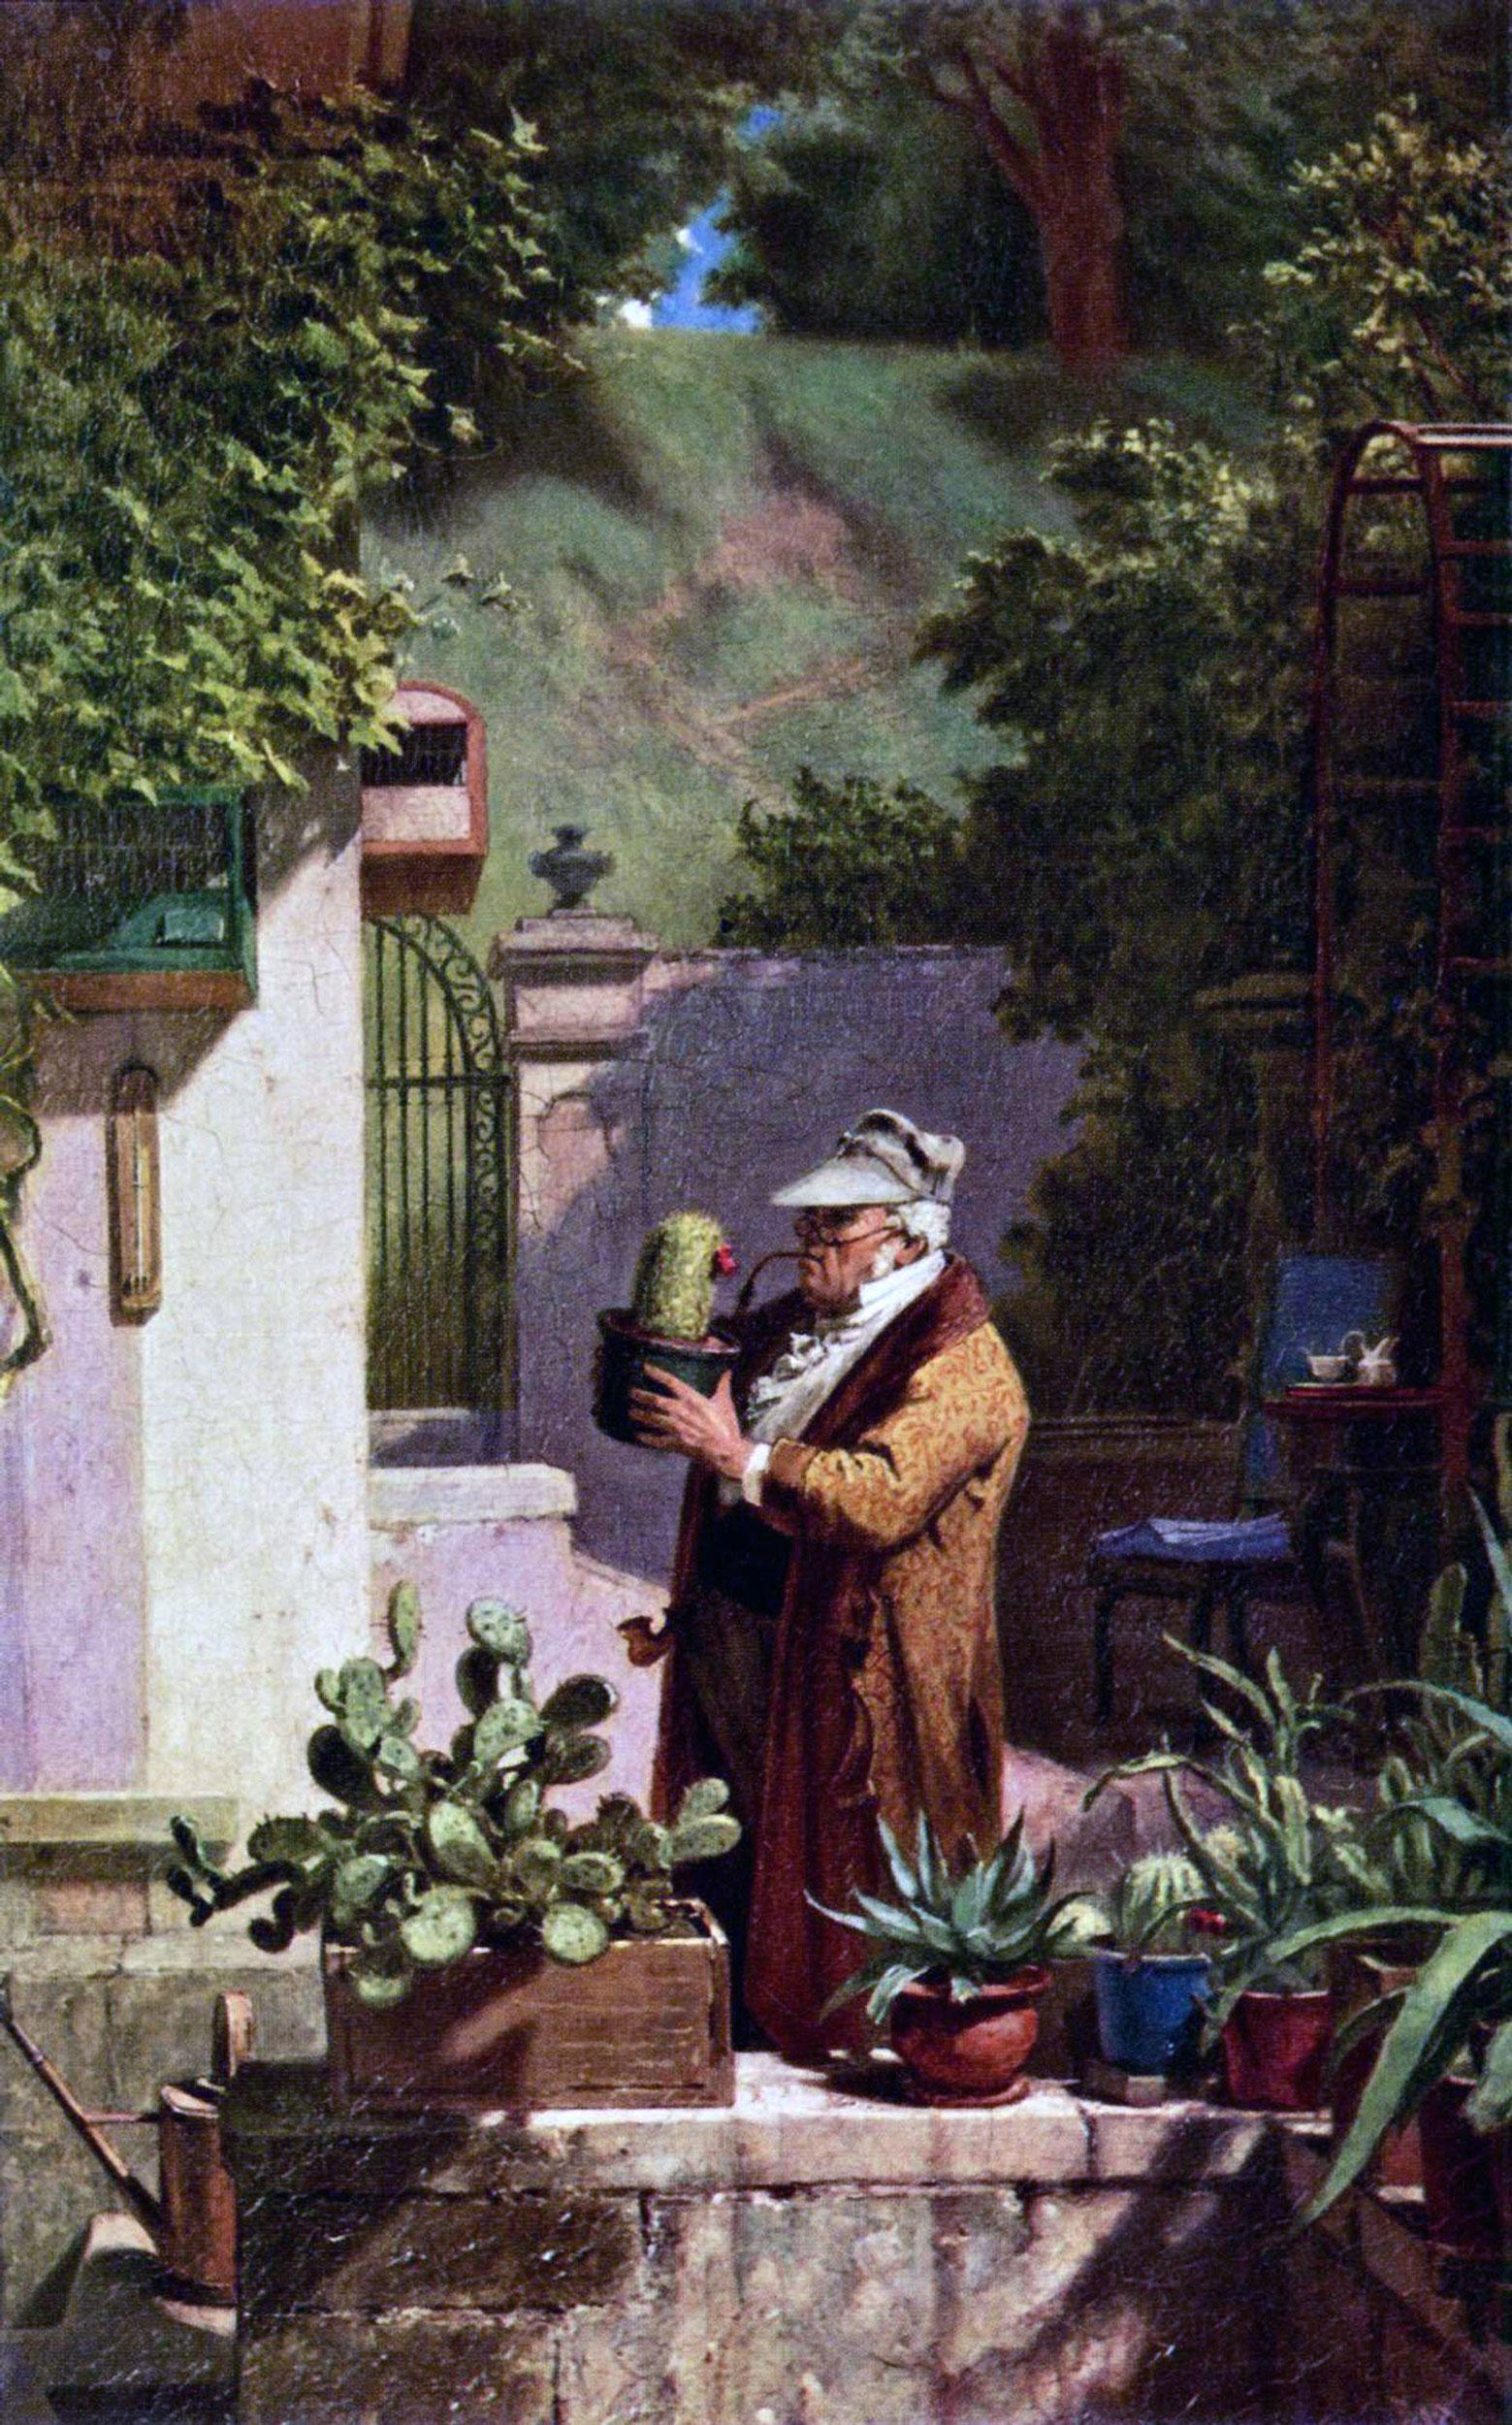 Carl Spitzweg - Der Pfarrer als Kakteenfreund, 1870, Schattenfugenrahmen Natur